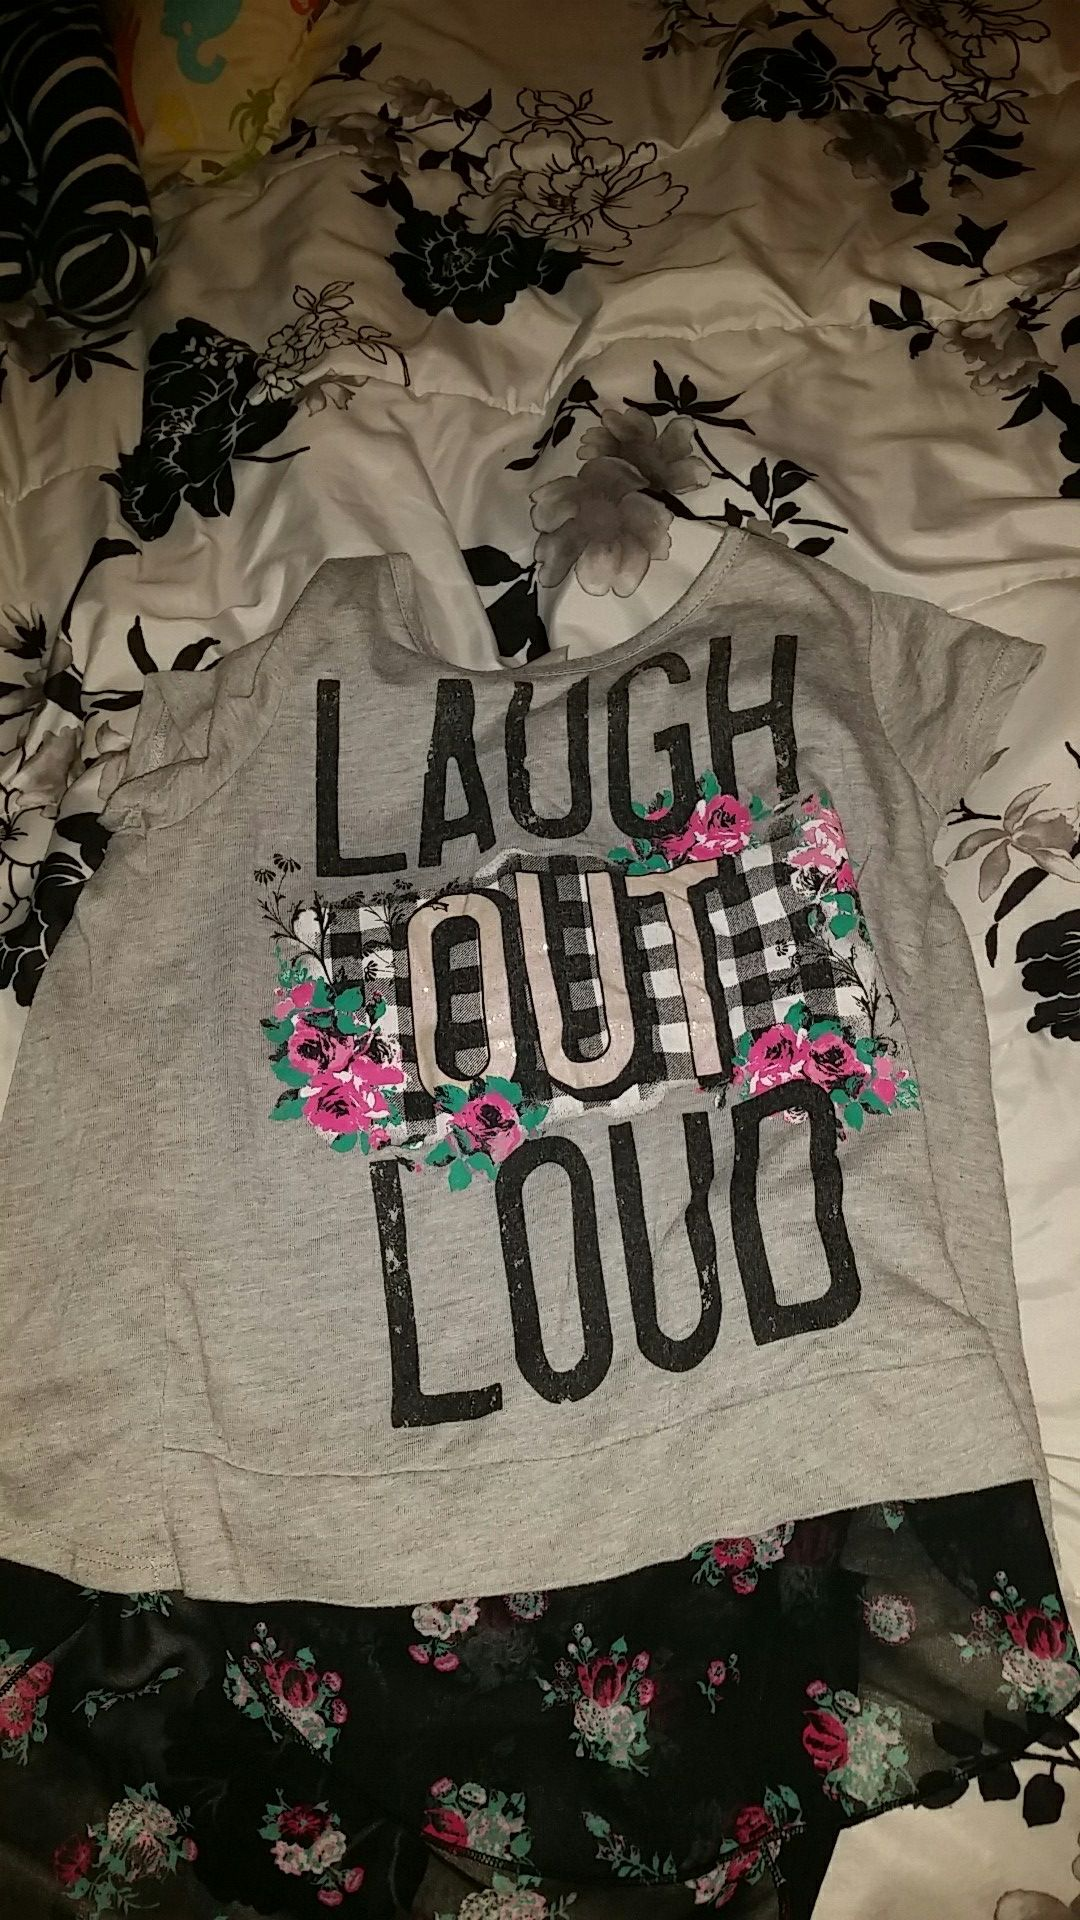 Clothes 9 shirts